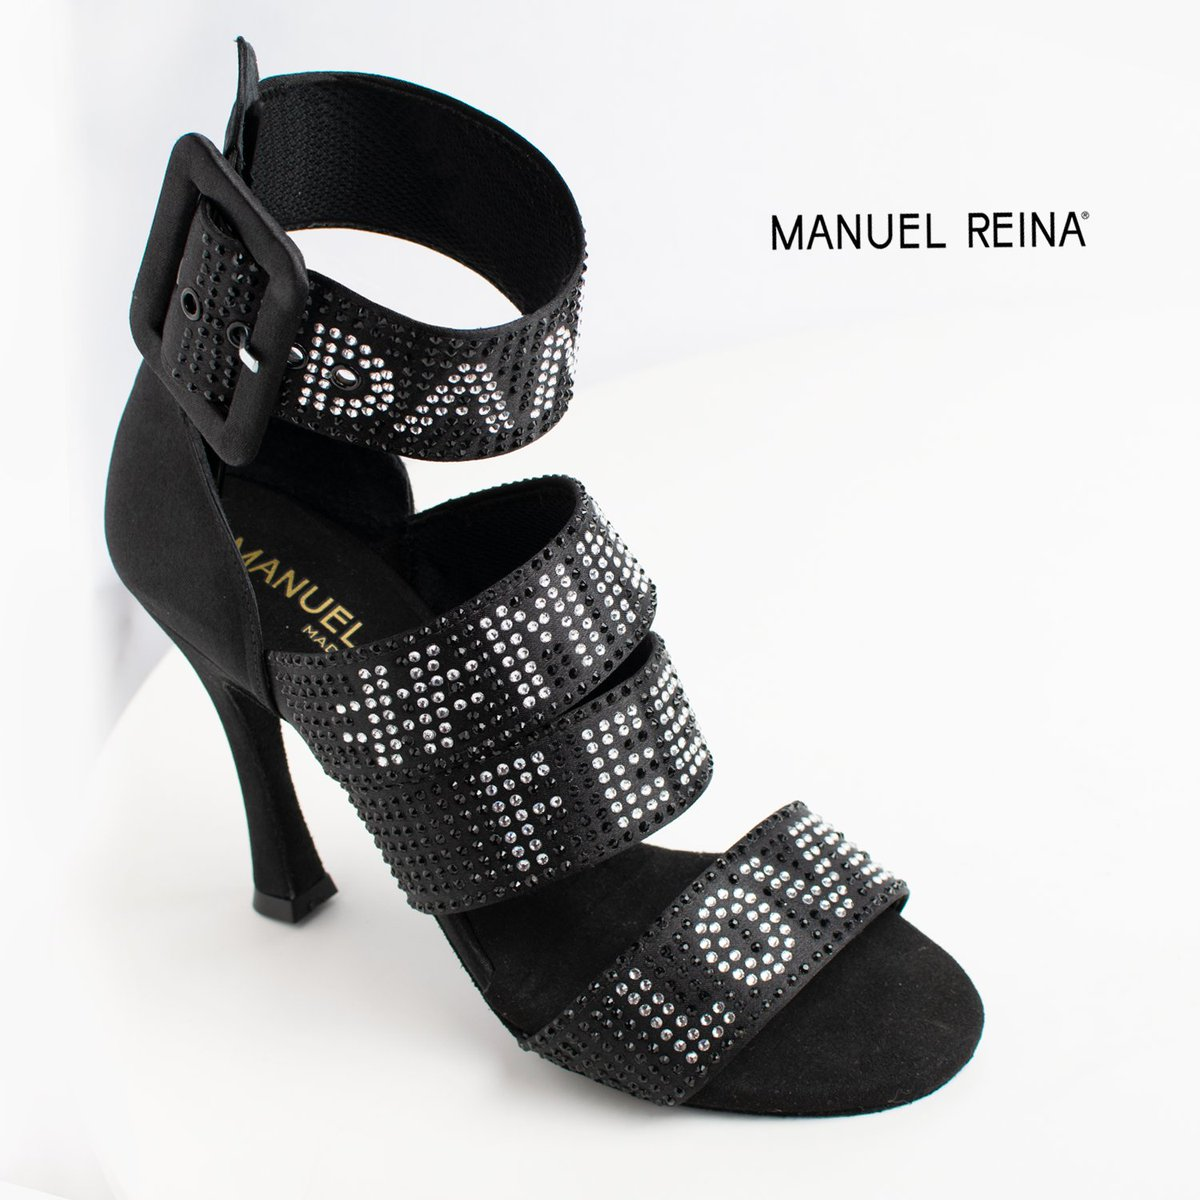 When your dreams come true Mod: Obsession B  Price: 195€  Authentic Handmade Shoes  • • • #salsa #bachata #sandals #baile #pumps #danza #merengue #sandal #manuelreina #mnlrnshs #shoes #dance #kizomba #madrid #bailar #danielydesireeoficial #kizomba #latinas #dancerspic.twitter.com/aiab1mqSr0